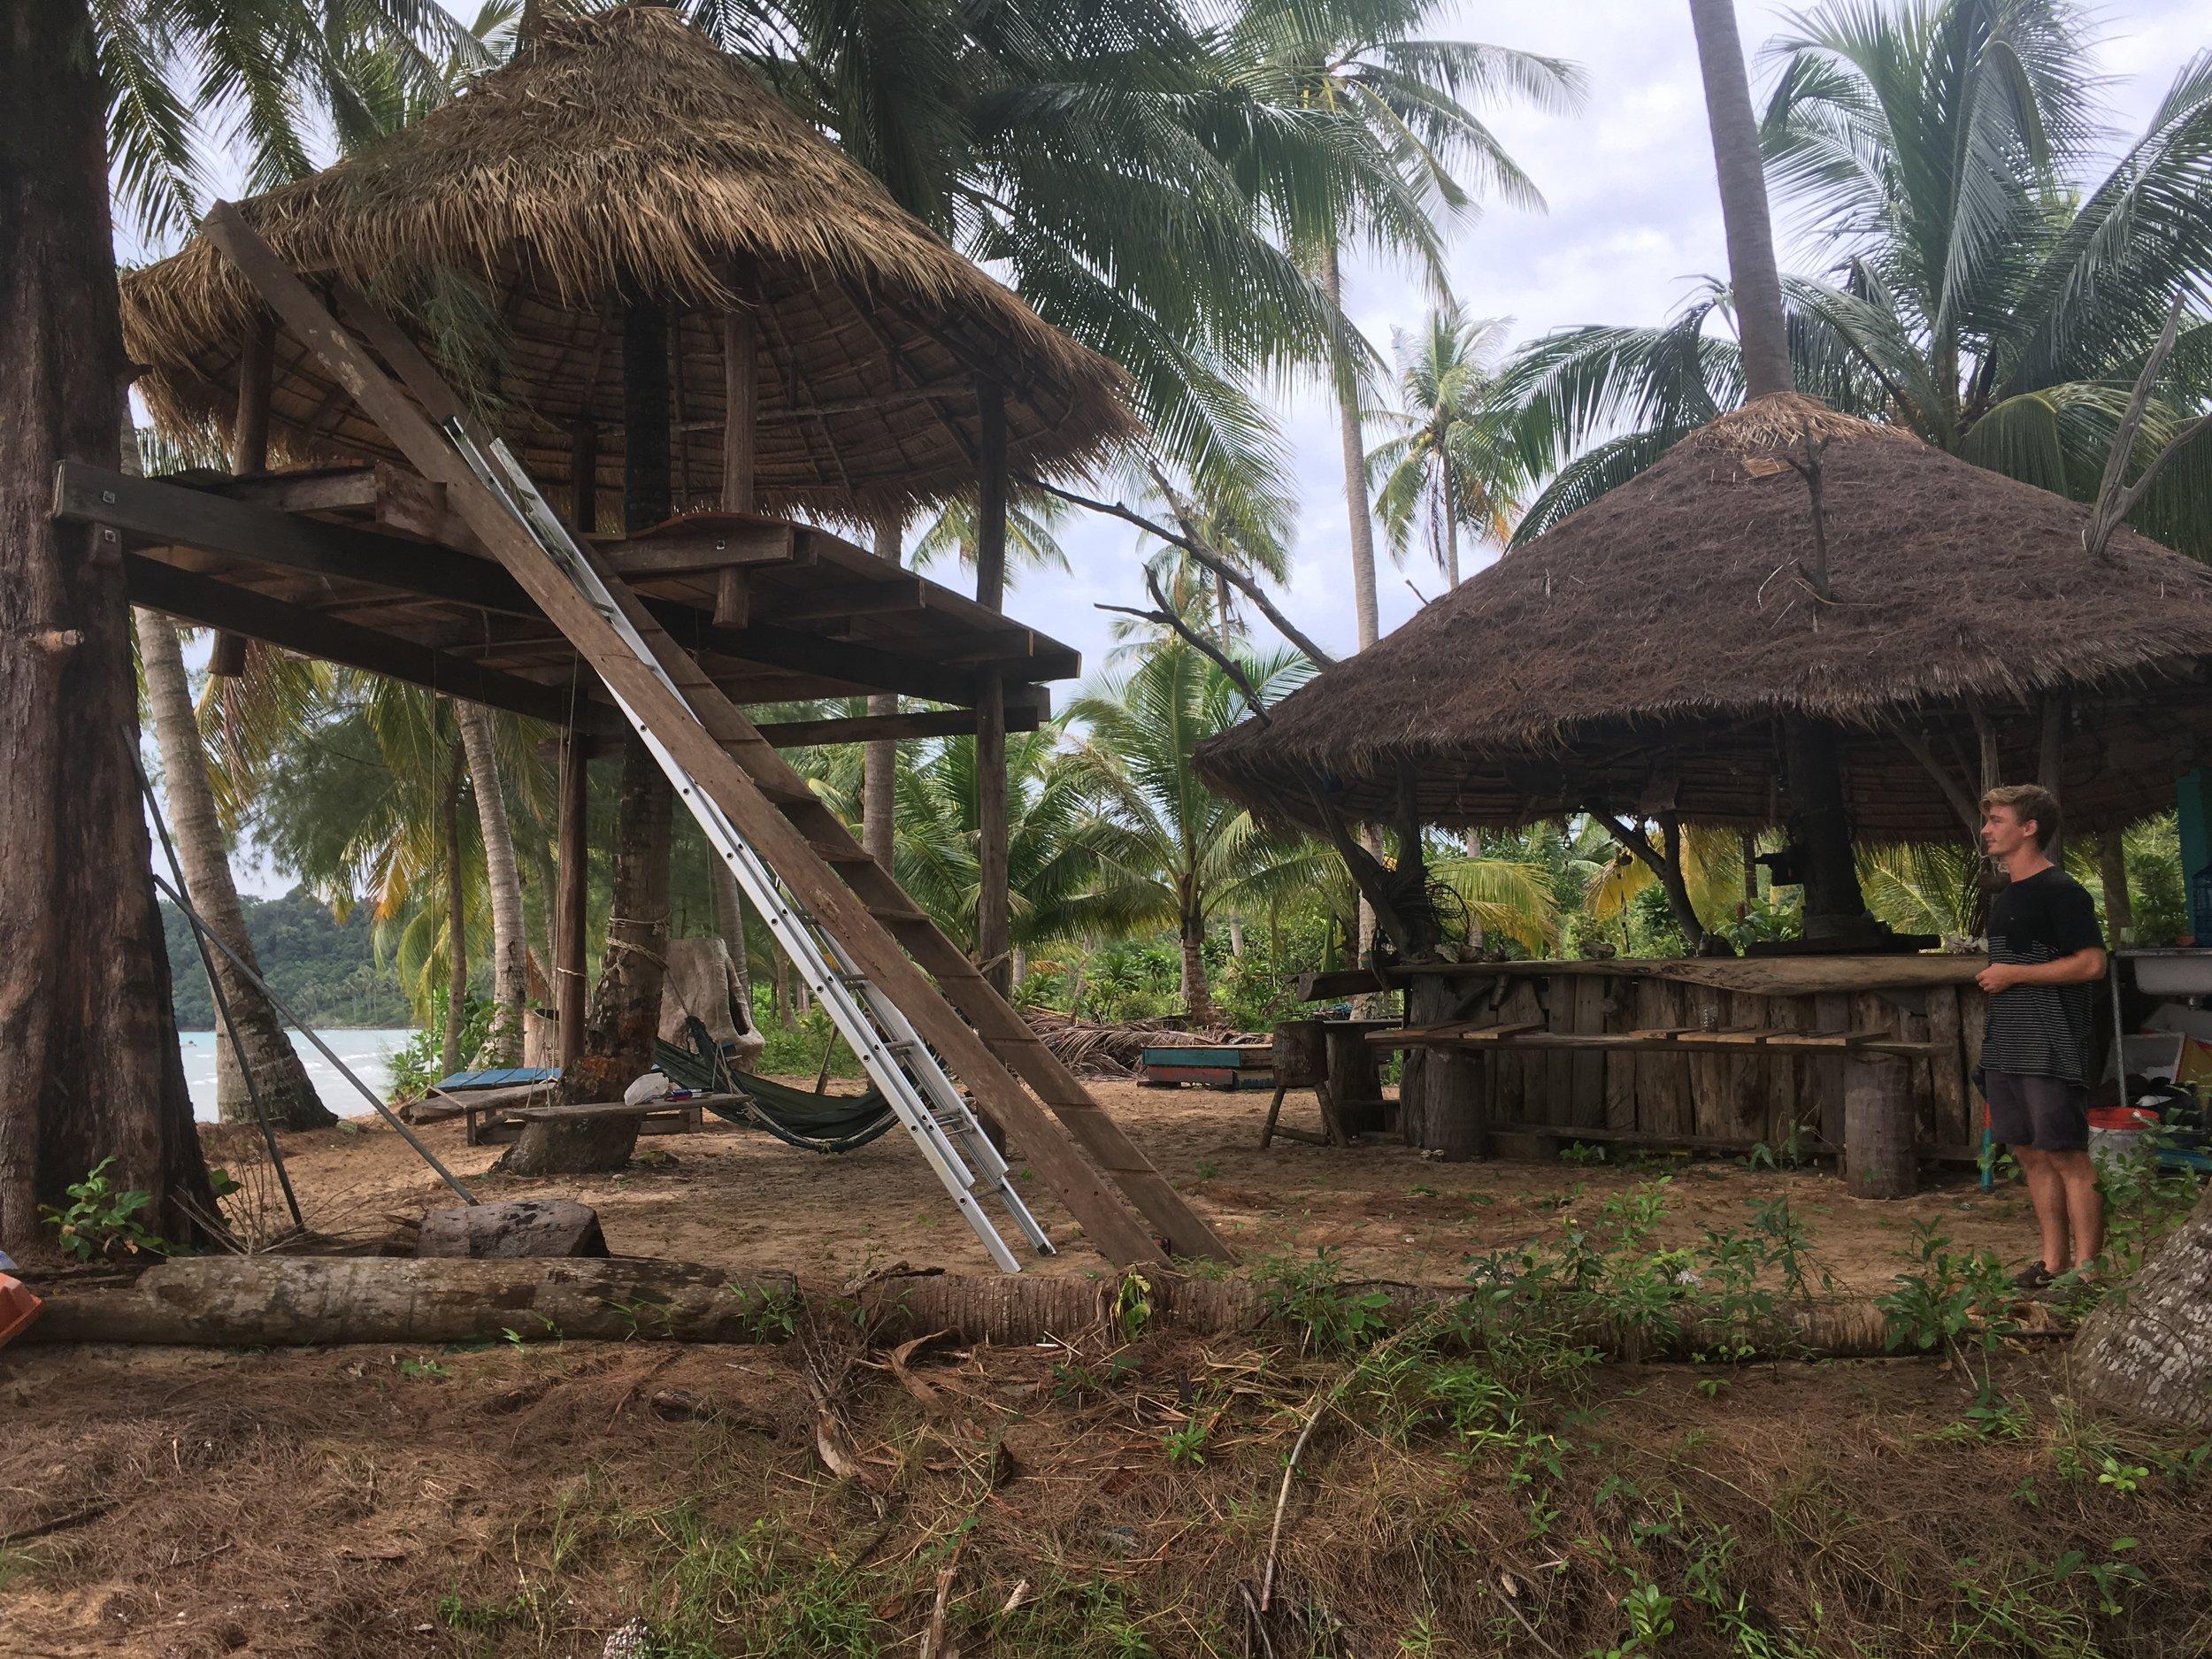 08 Cambodia Lonely beach volunteering.JPG